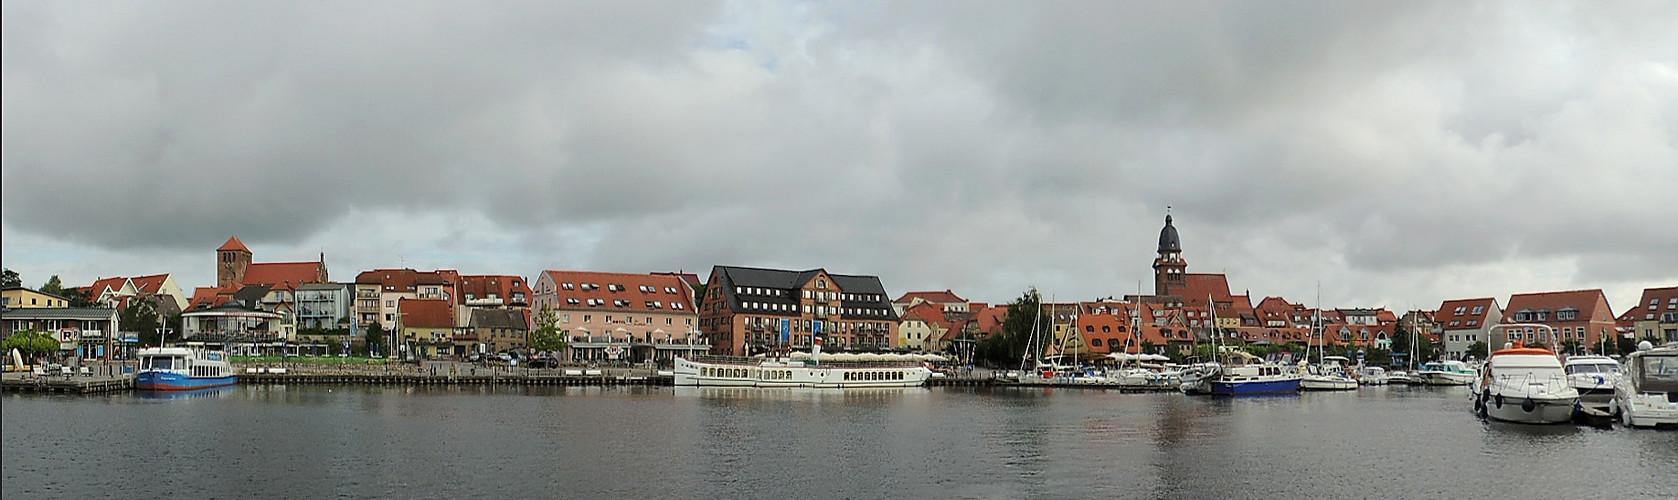 Stadthafen in Waren